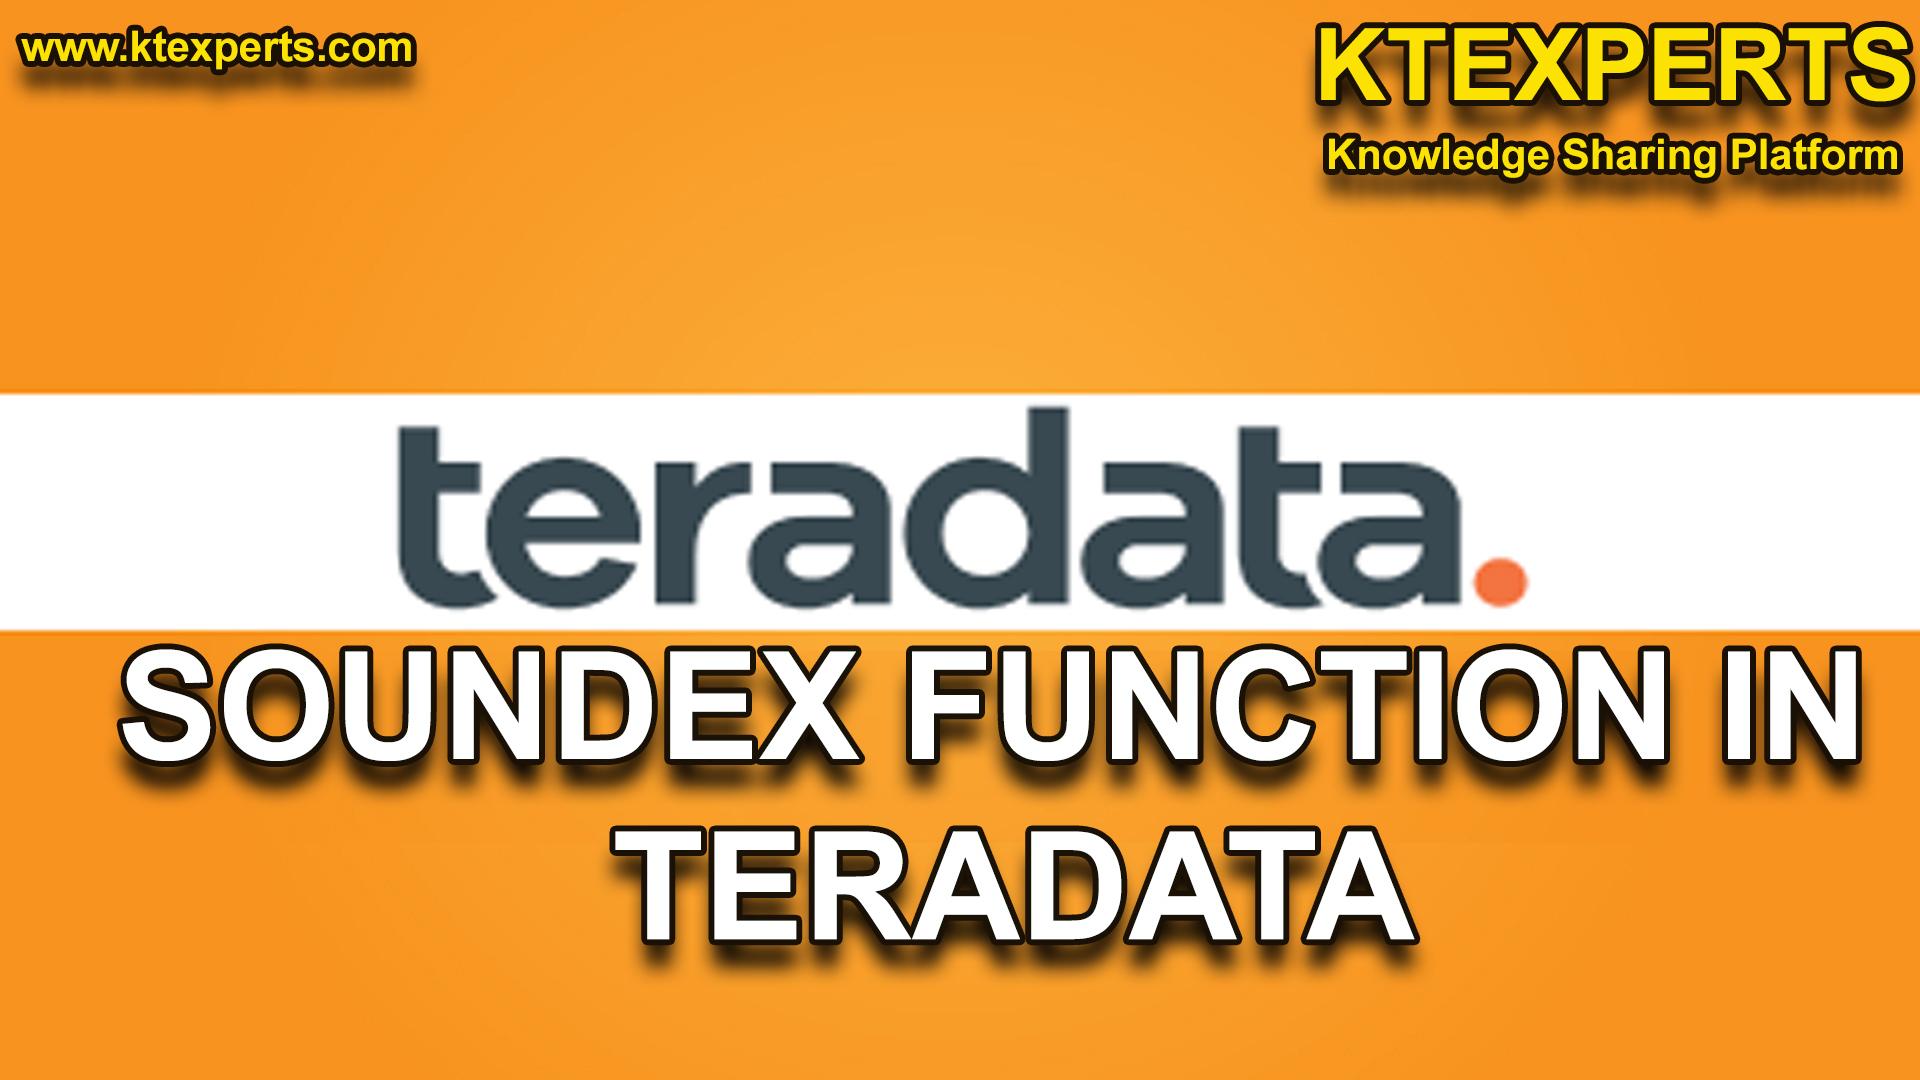 SOUNDEX FUNCTION IN TERADATA